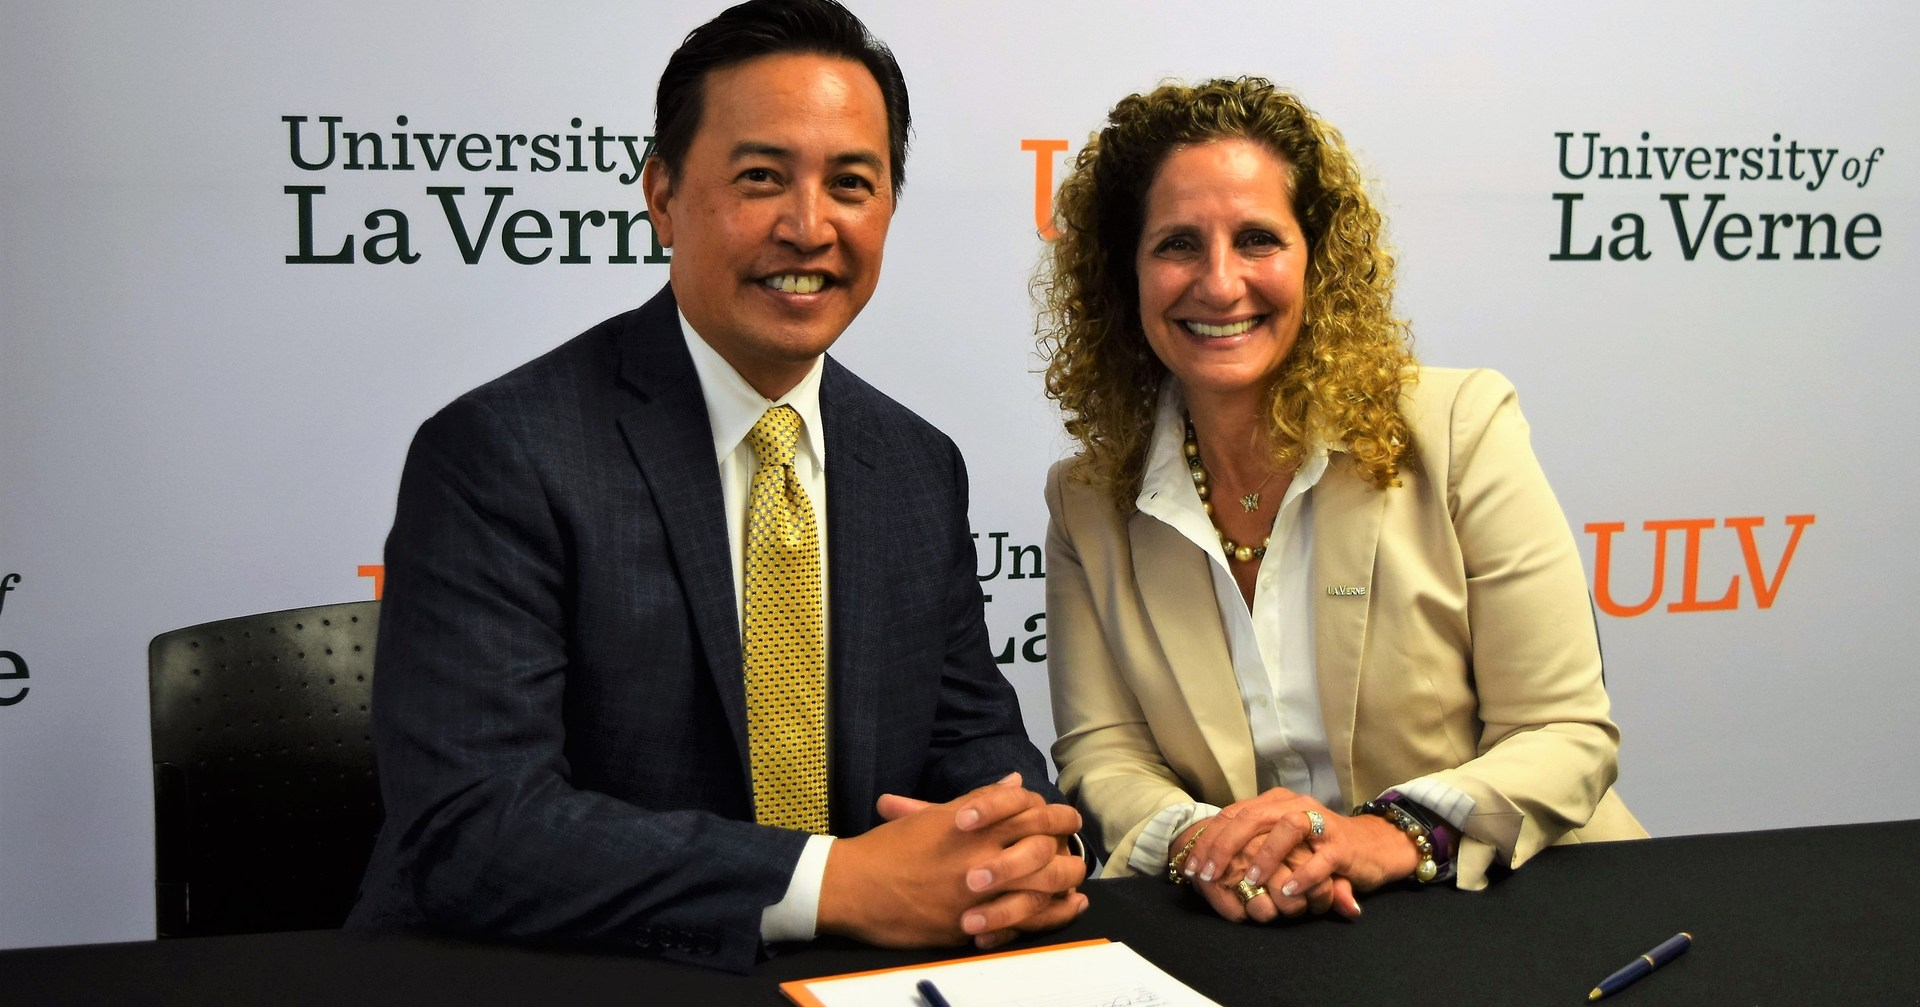 Baldwin Park Unified Celebrates ULV Admissions Partnership